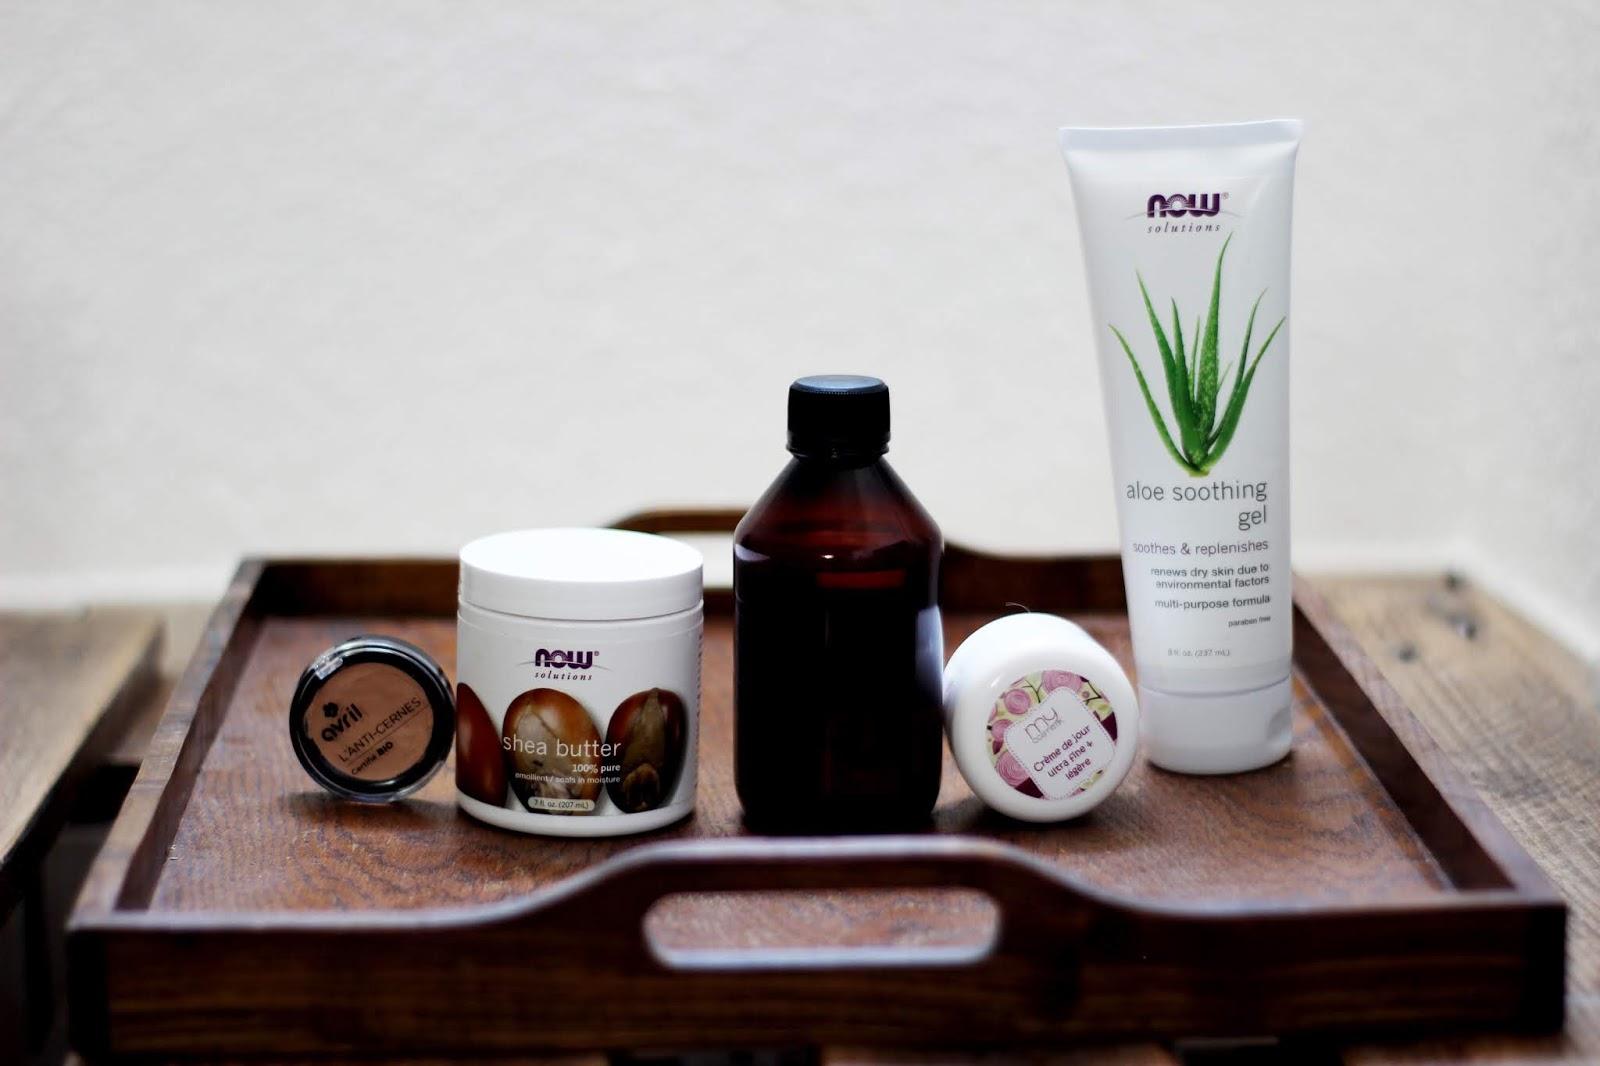 Maquillage vegan et zéro dechet